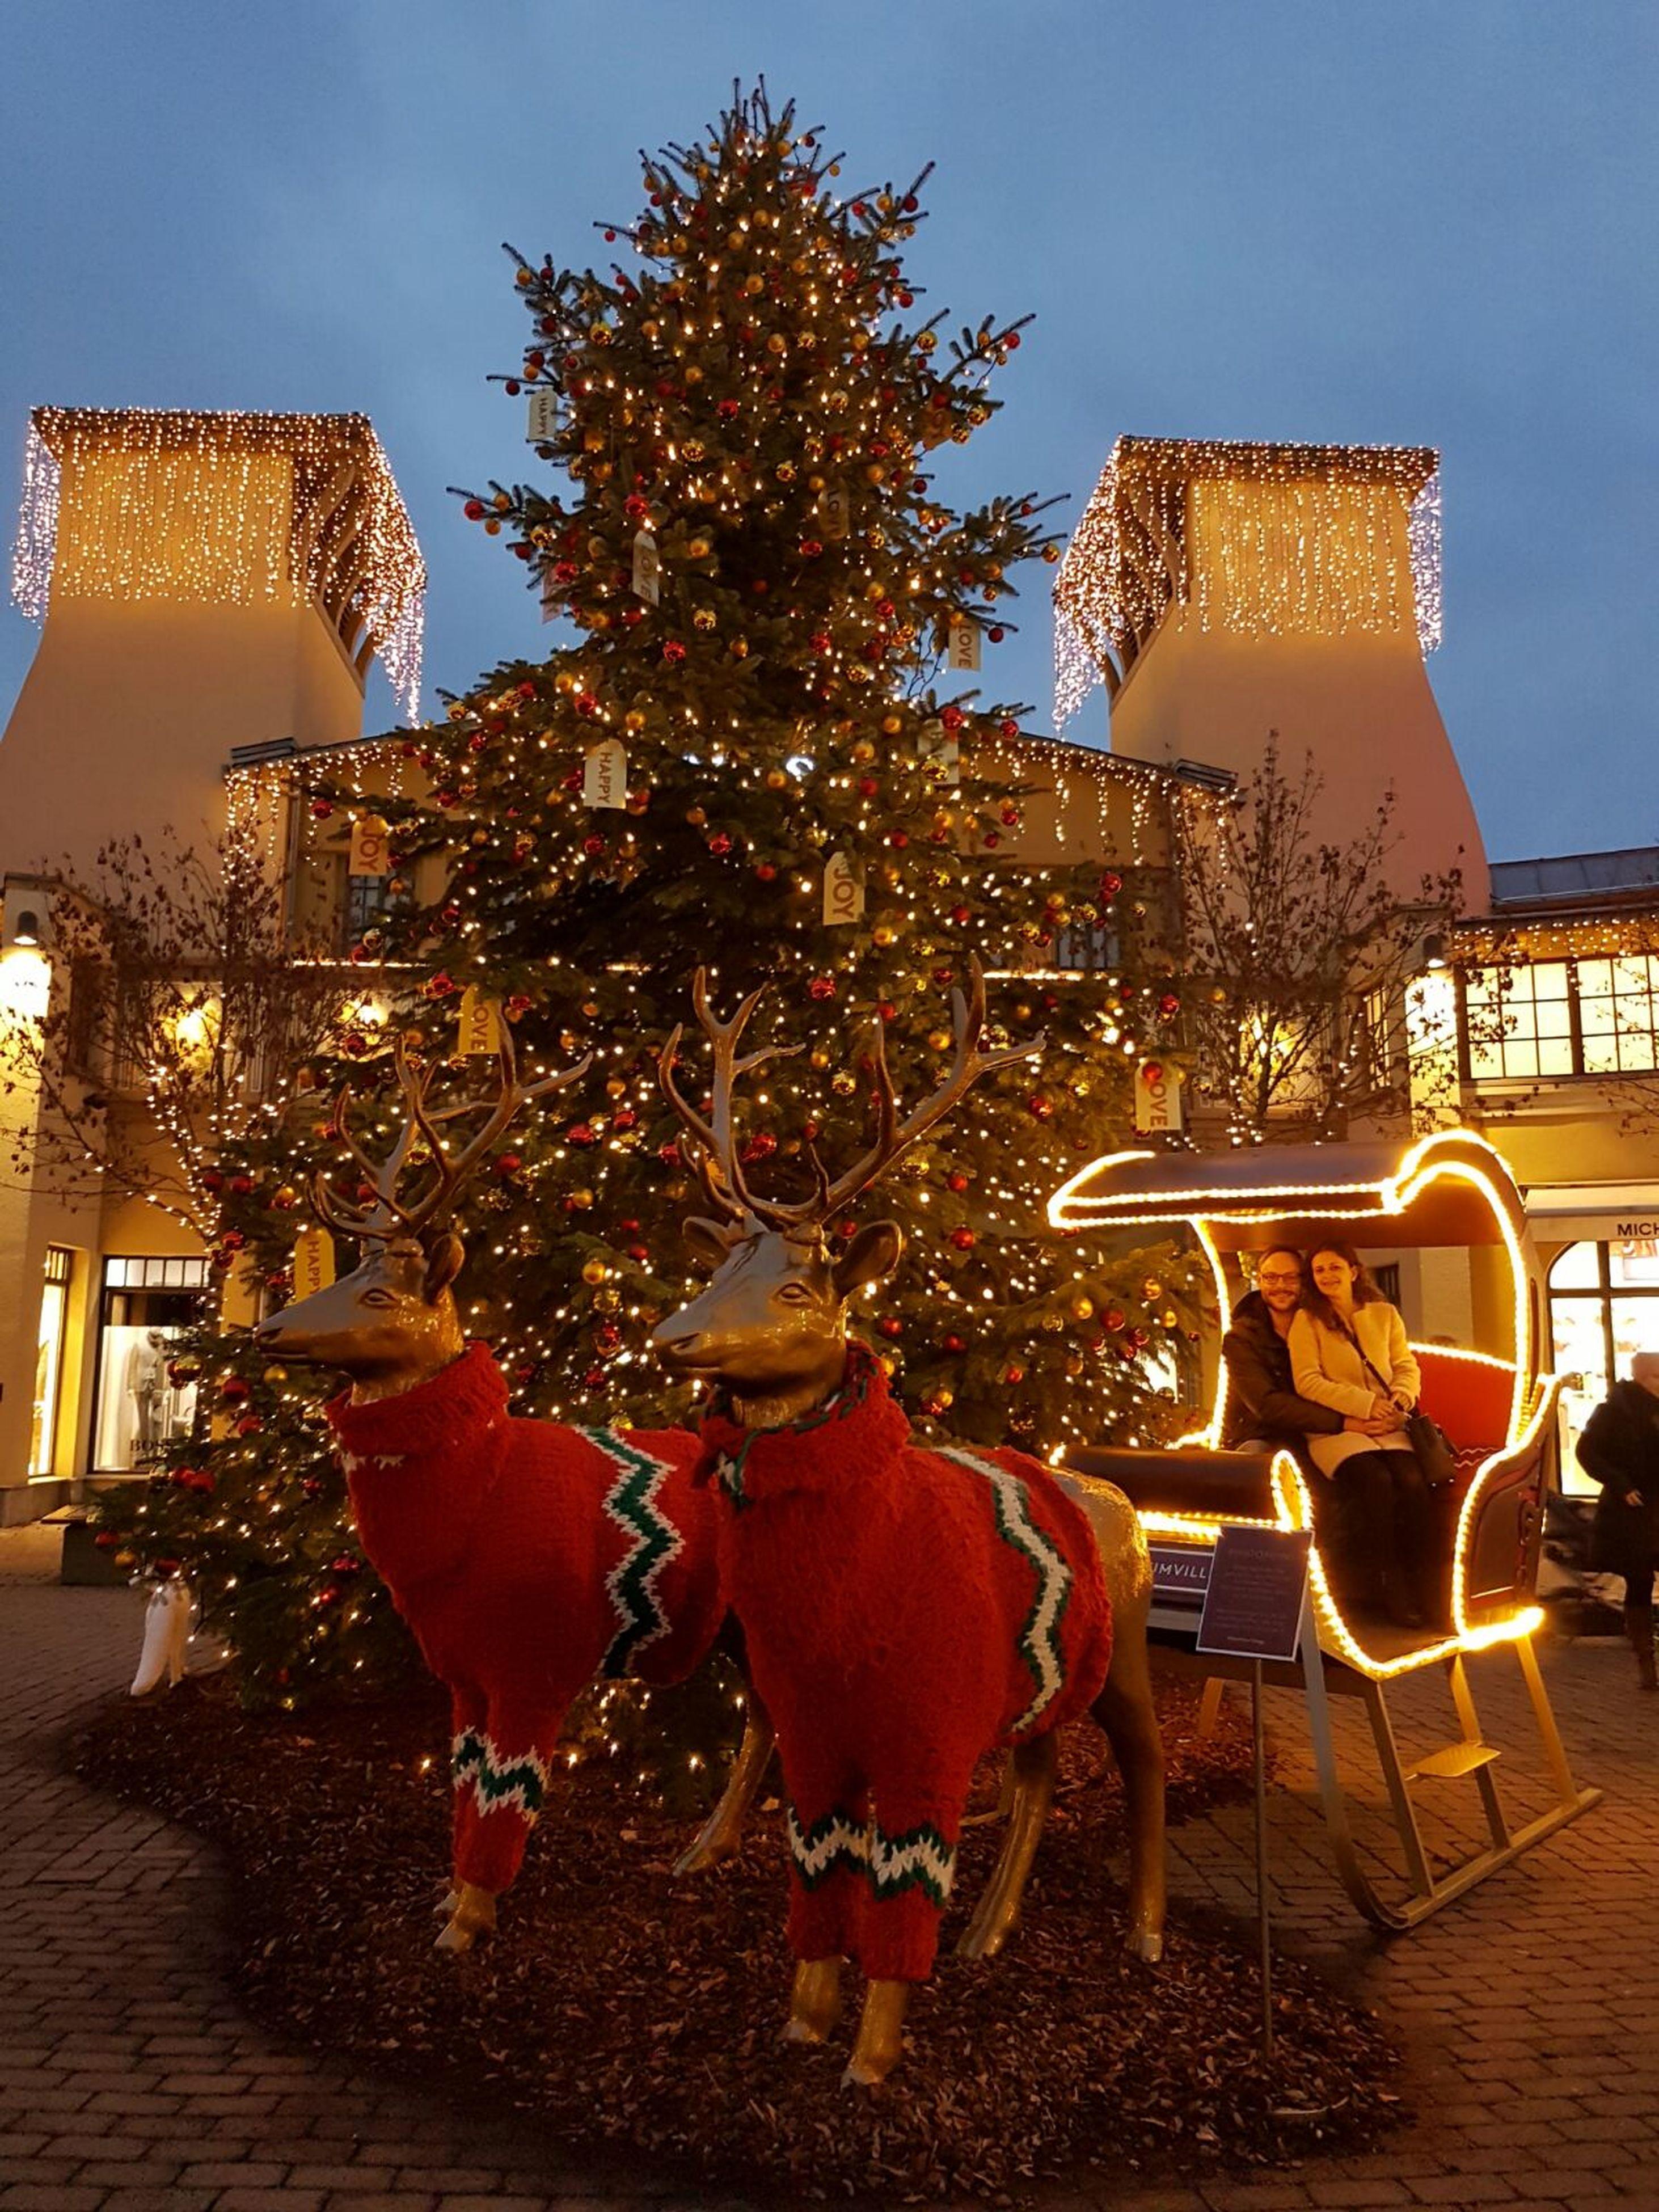 christmas, celebration, christmas tree, tree, christmas lights, christmas decoration, illuminated, tradition, holiday - event, christmas ornament, no people, sky, city, outdoors, architecture, christmas market